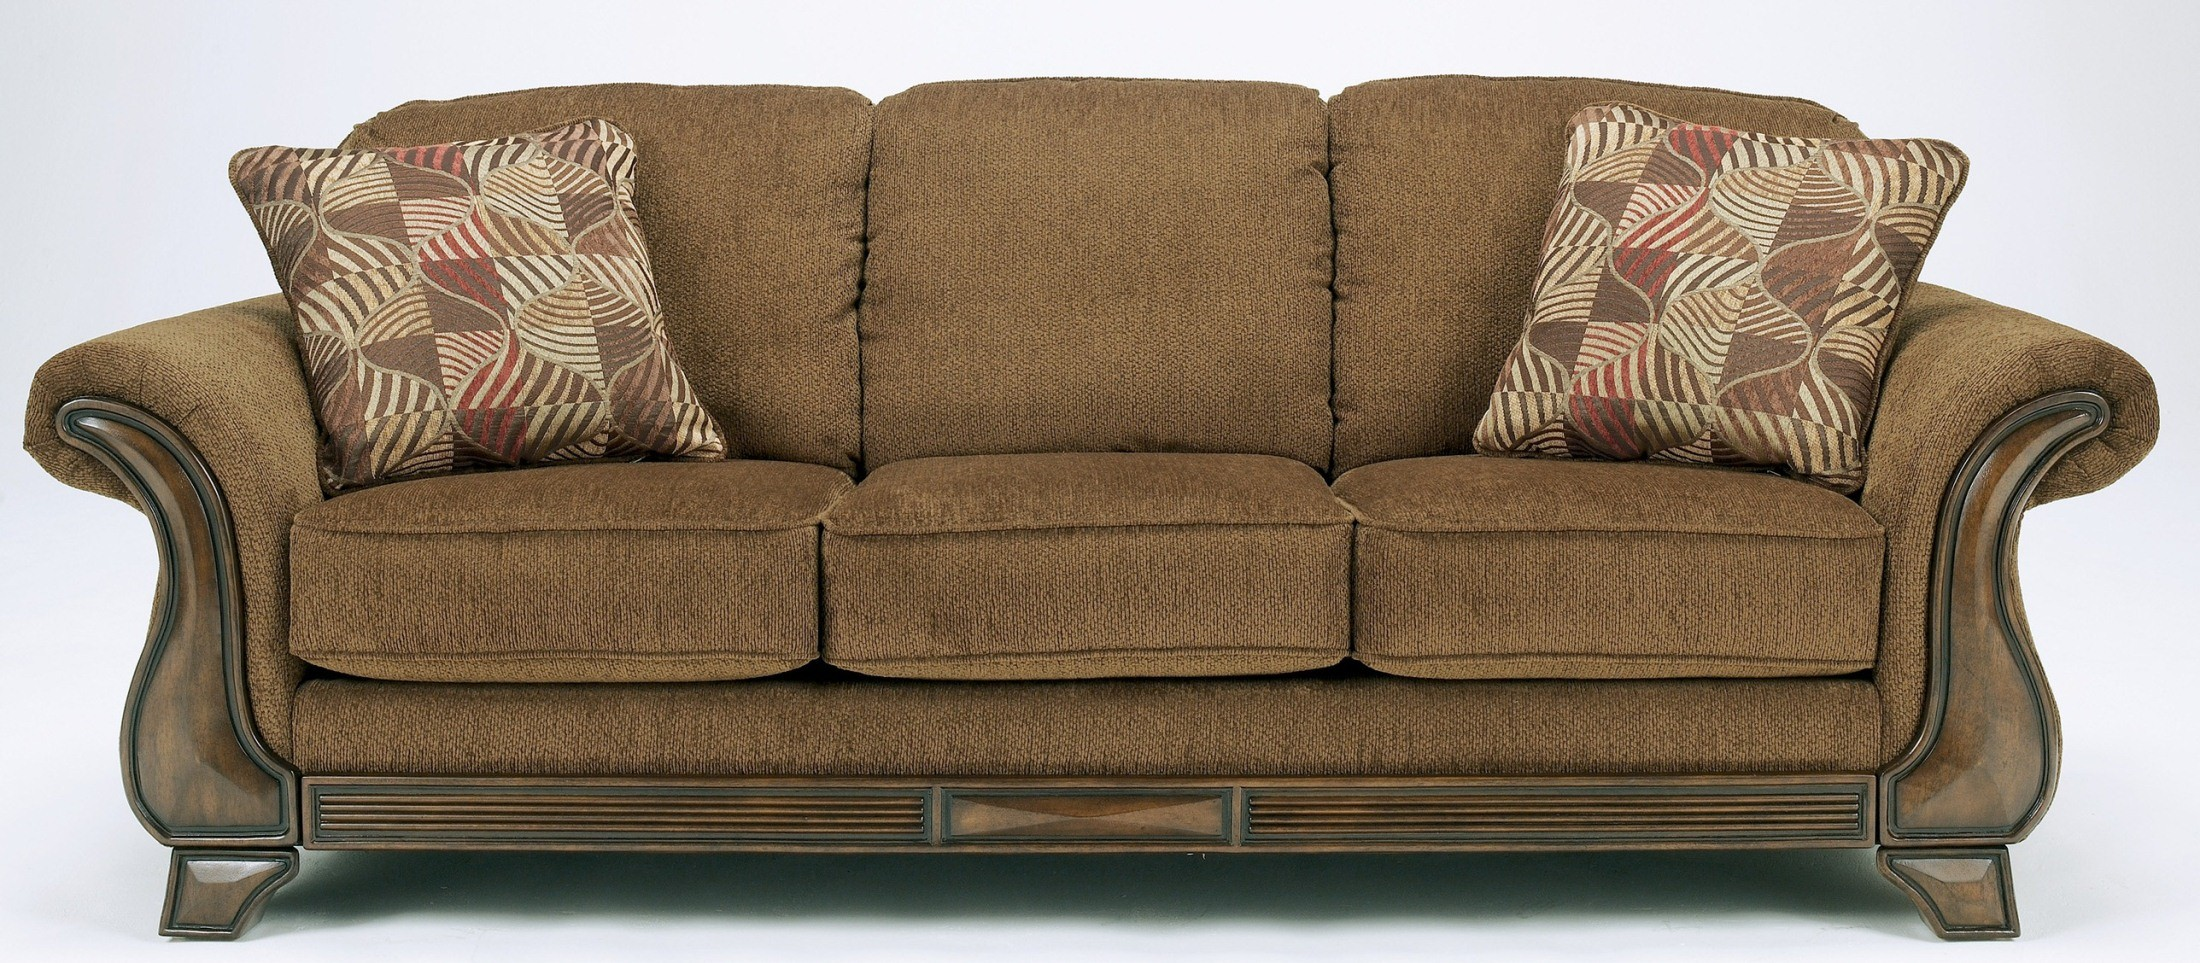 Montgomery Mocha Sofa From Ashley 3830038 Coleman